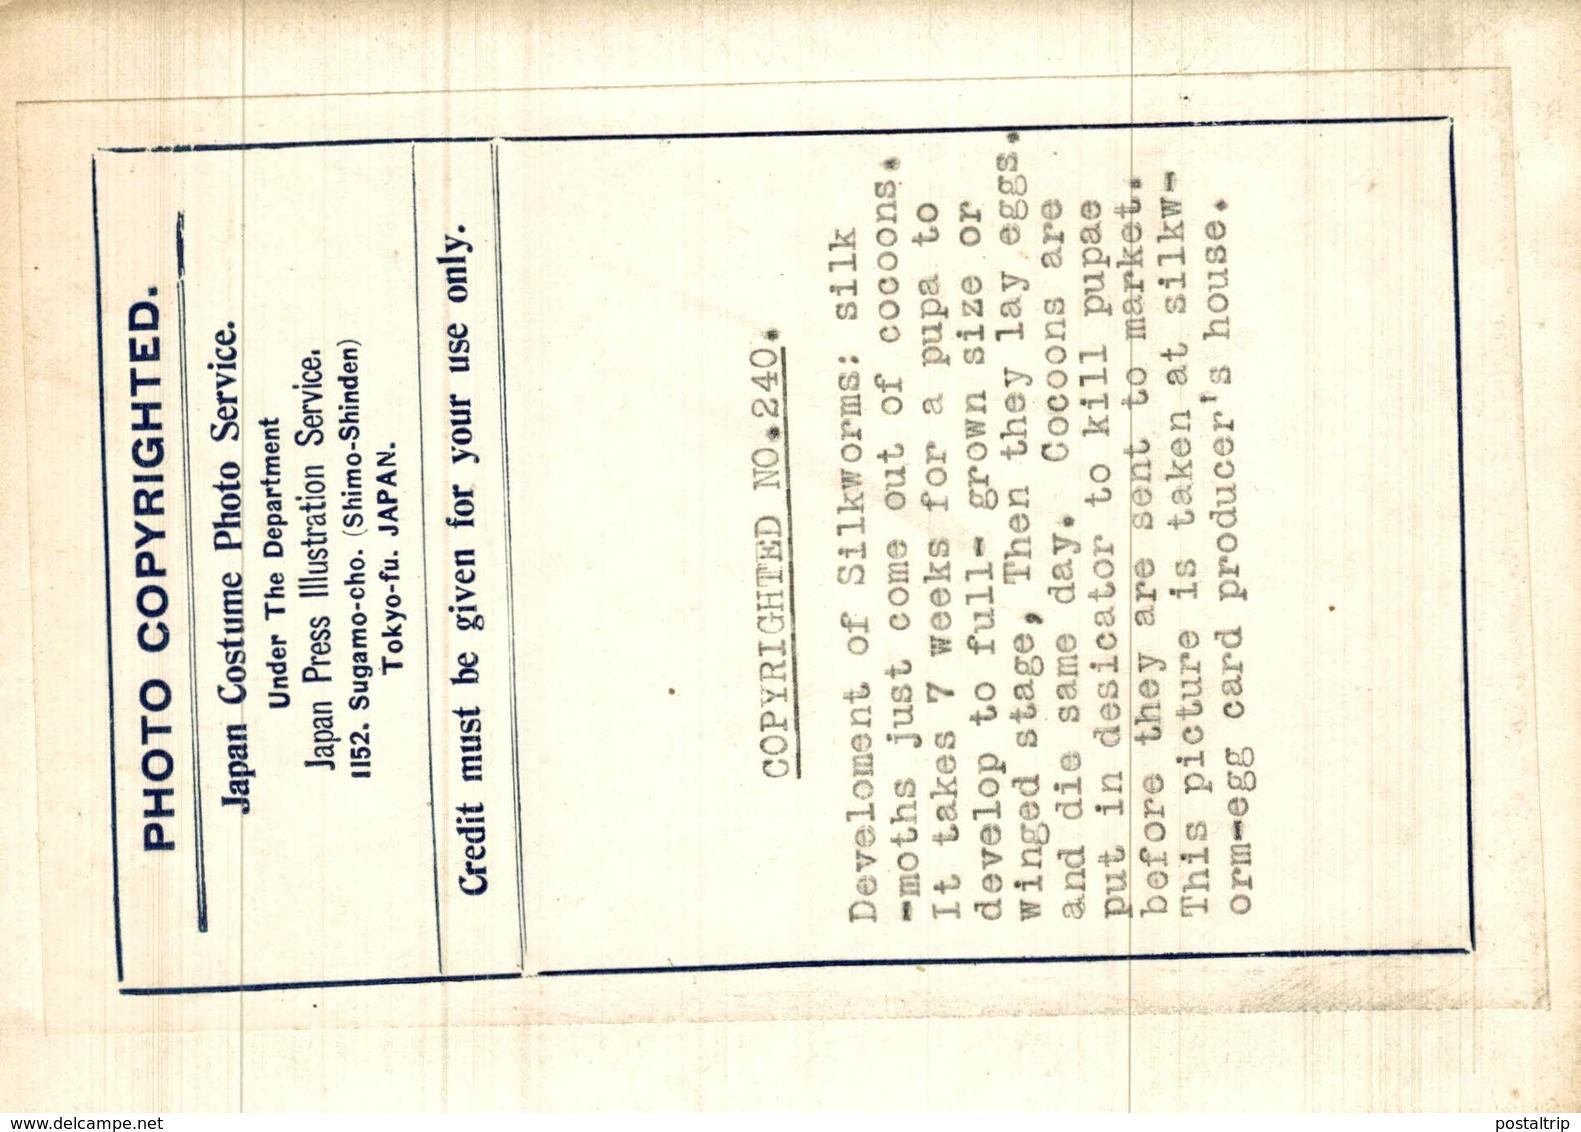 DEVELOPMENT SILKWORMS  SEDA  JAPAN JAPON  16*12CM Fonds Victor FORBIN 1864-1947 - Profesiones